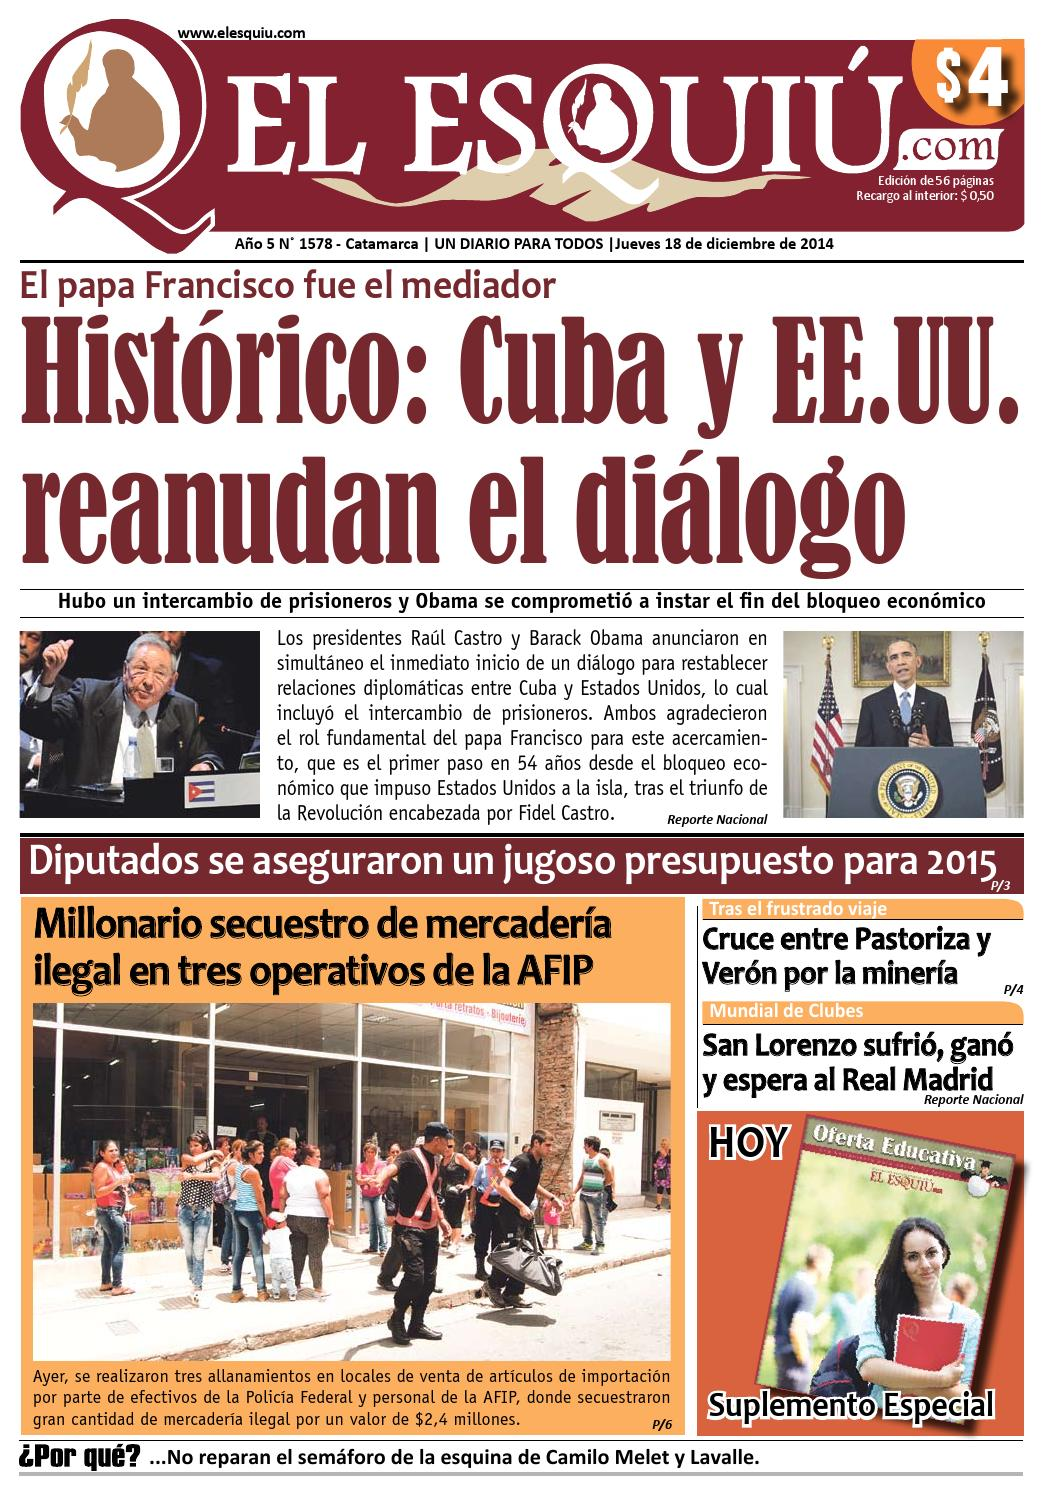 El Esquiu.com, jueves 18 de diciembre de 2014 by Editorial El Esquiú ...